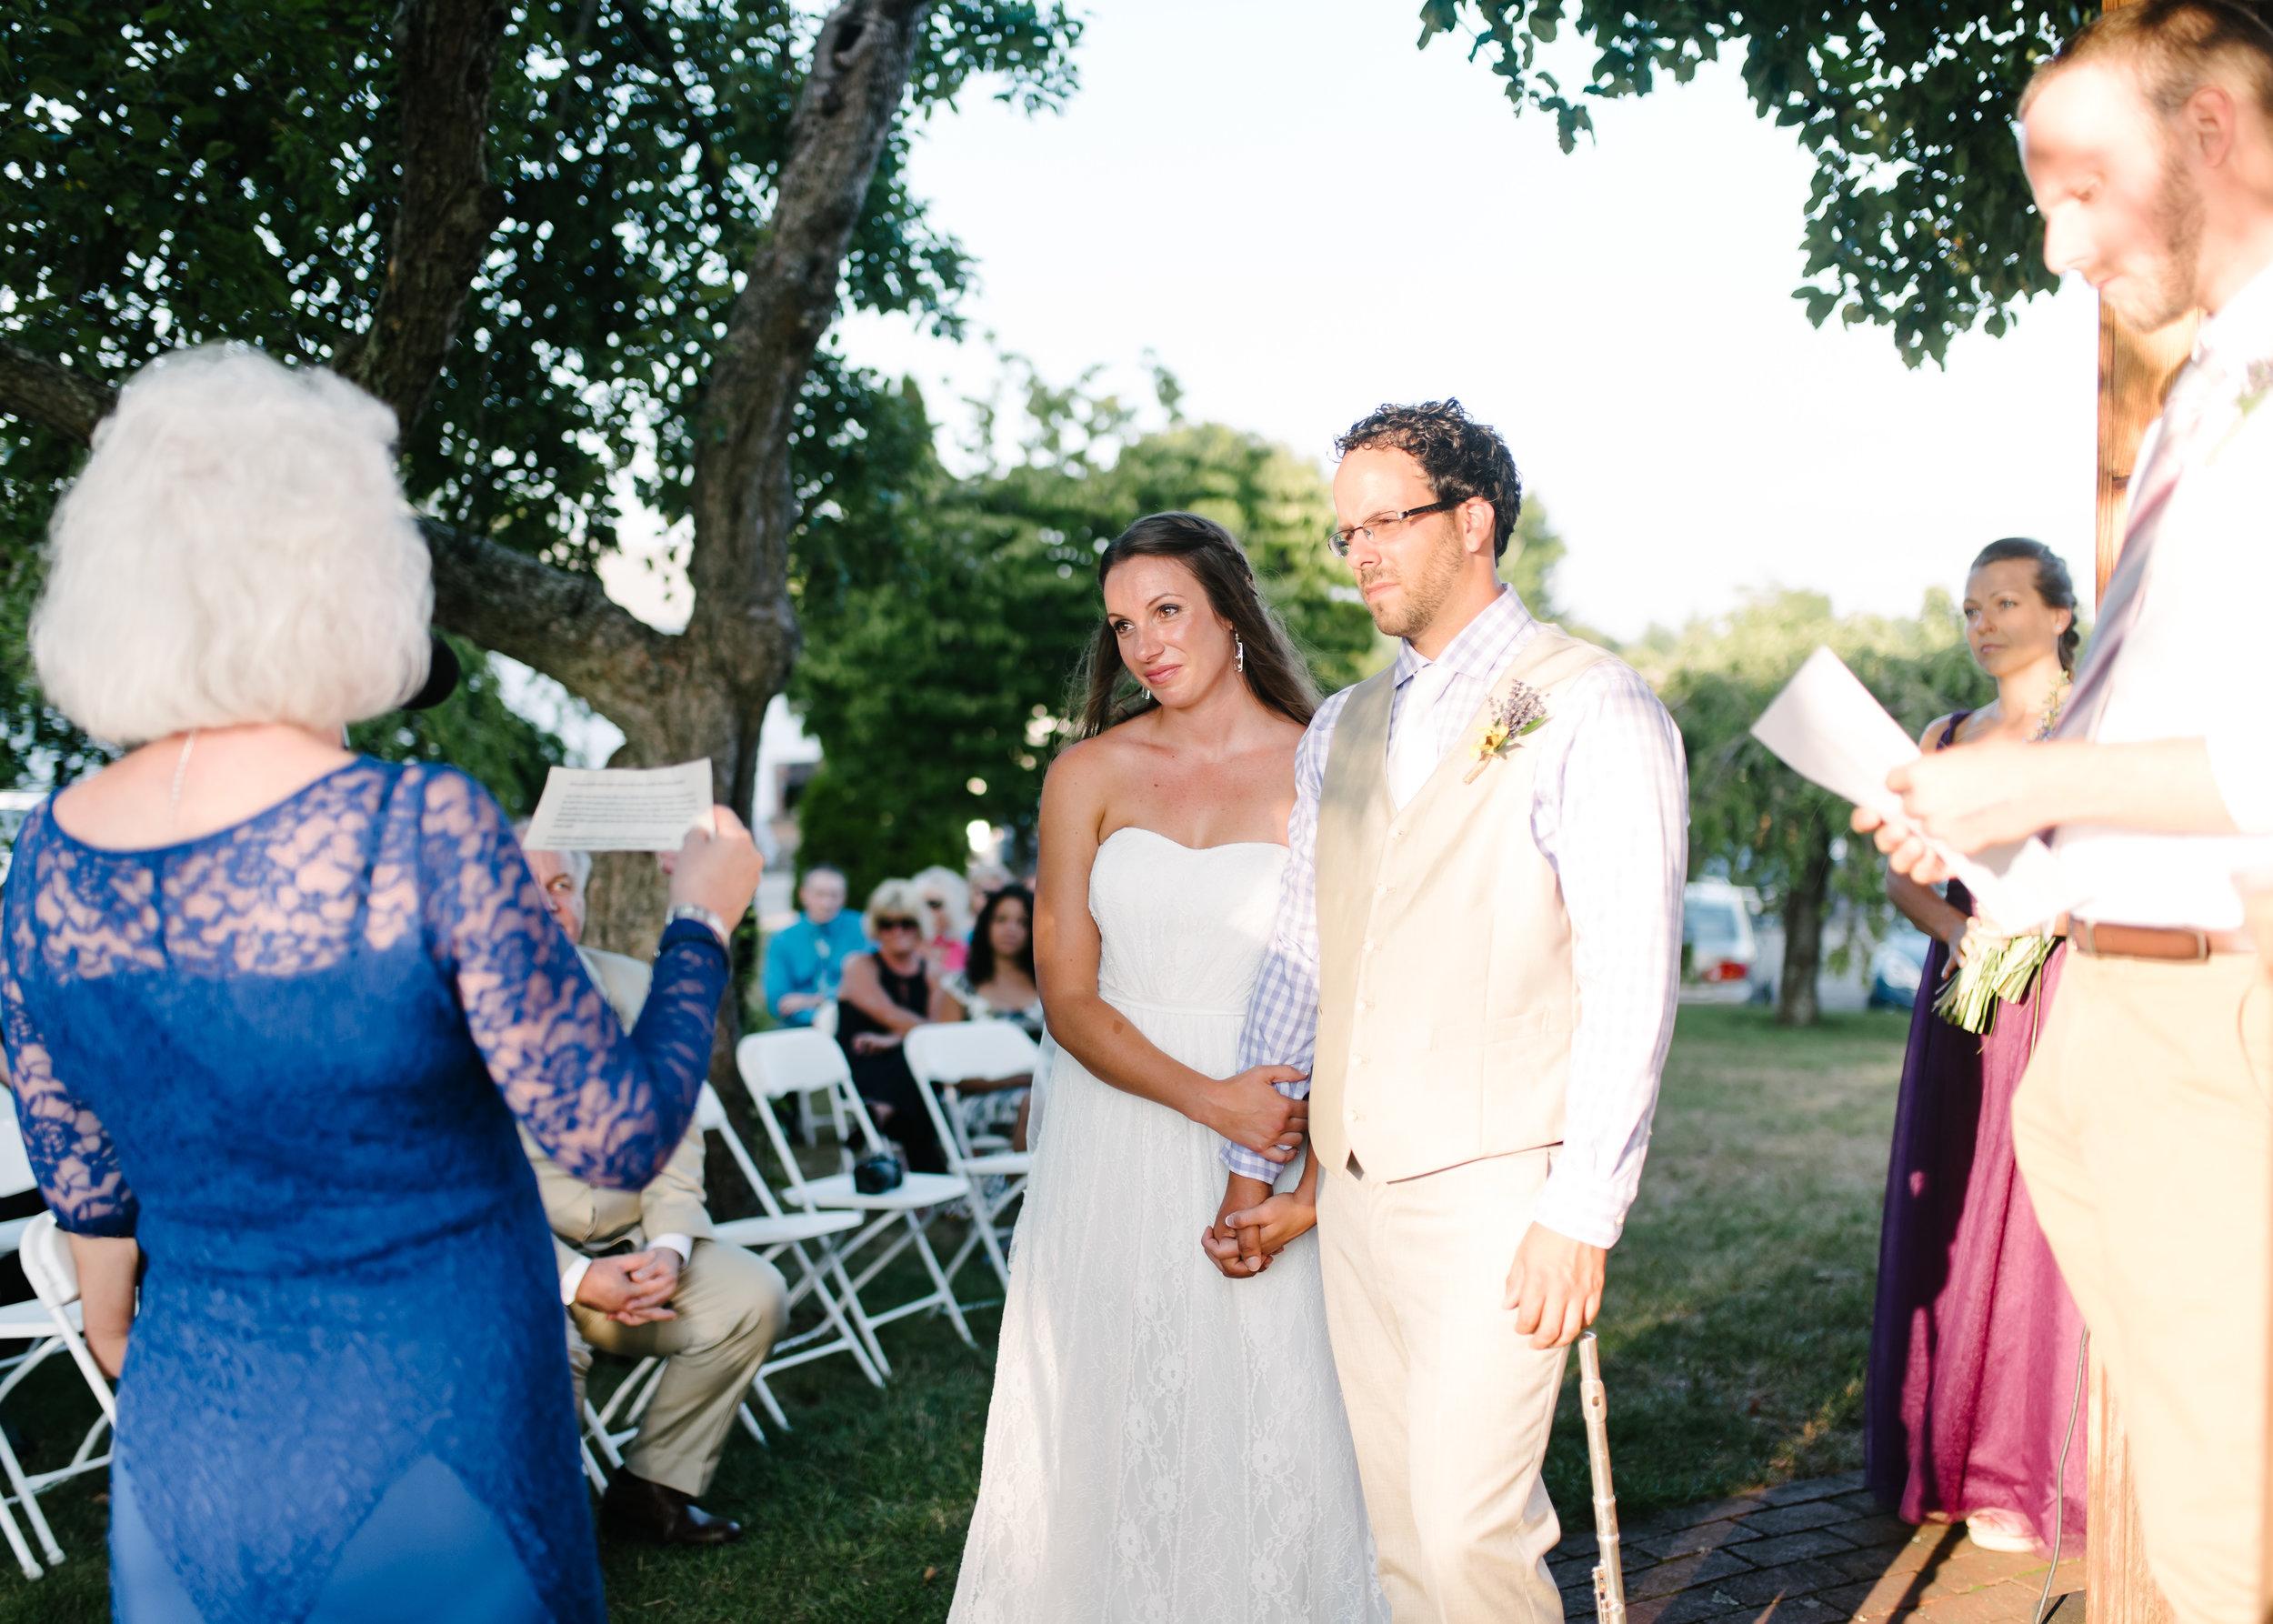 worcester-ma-wedding-photographer-4305.jpg